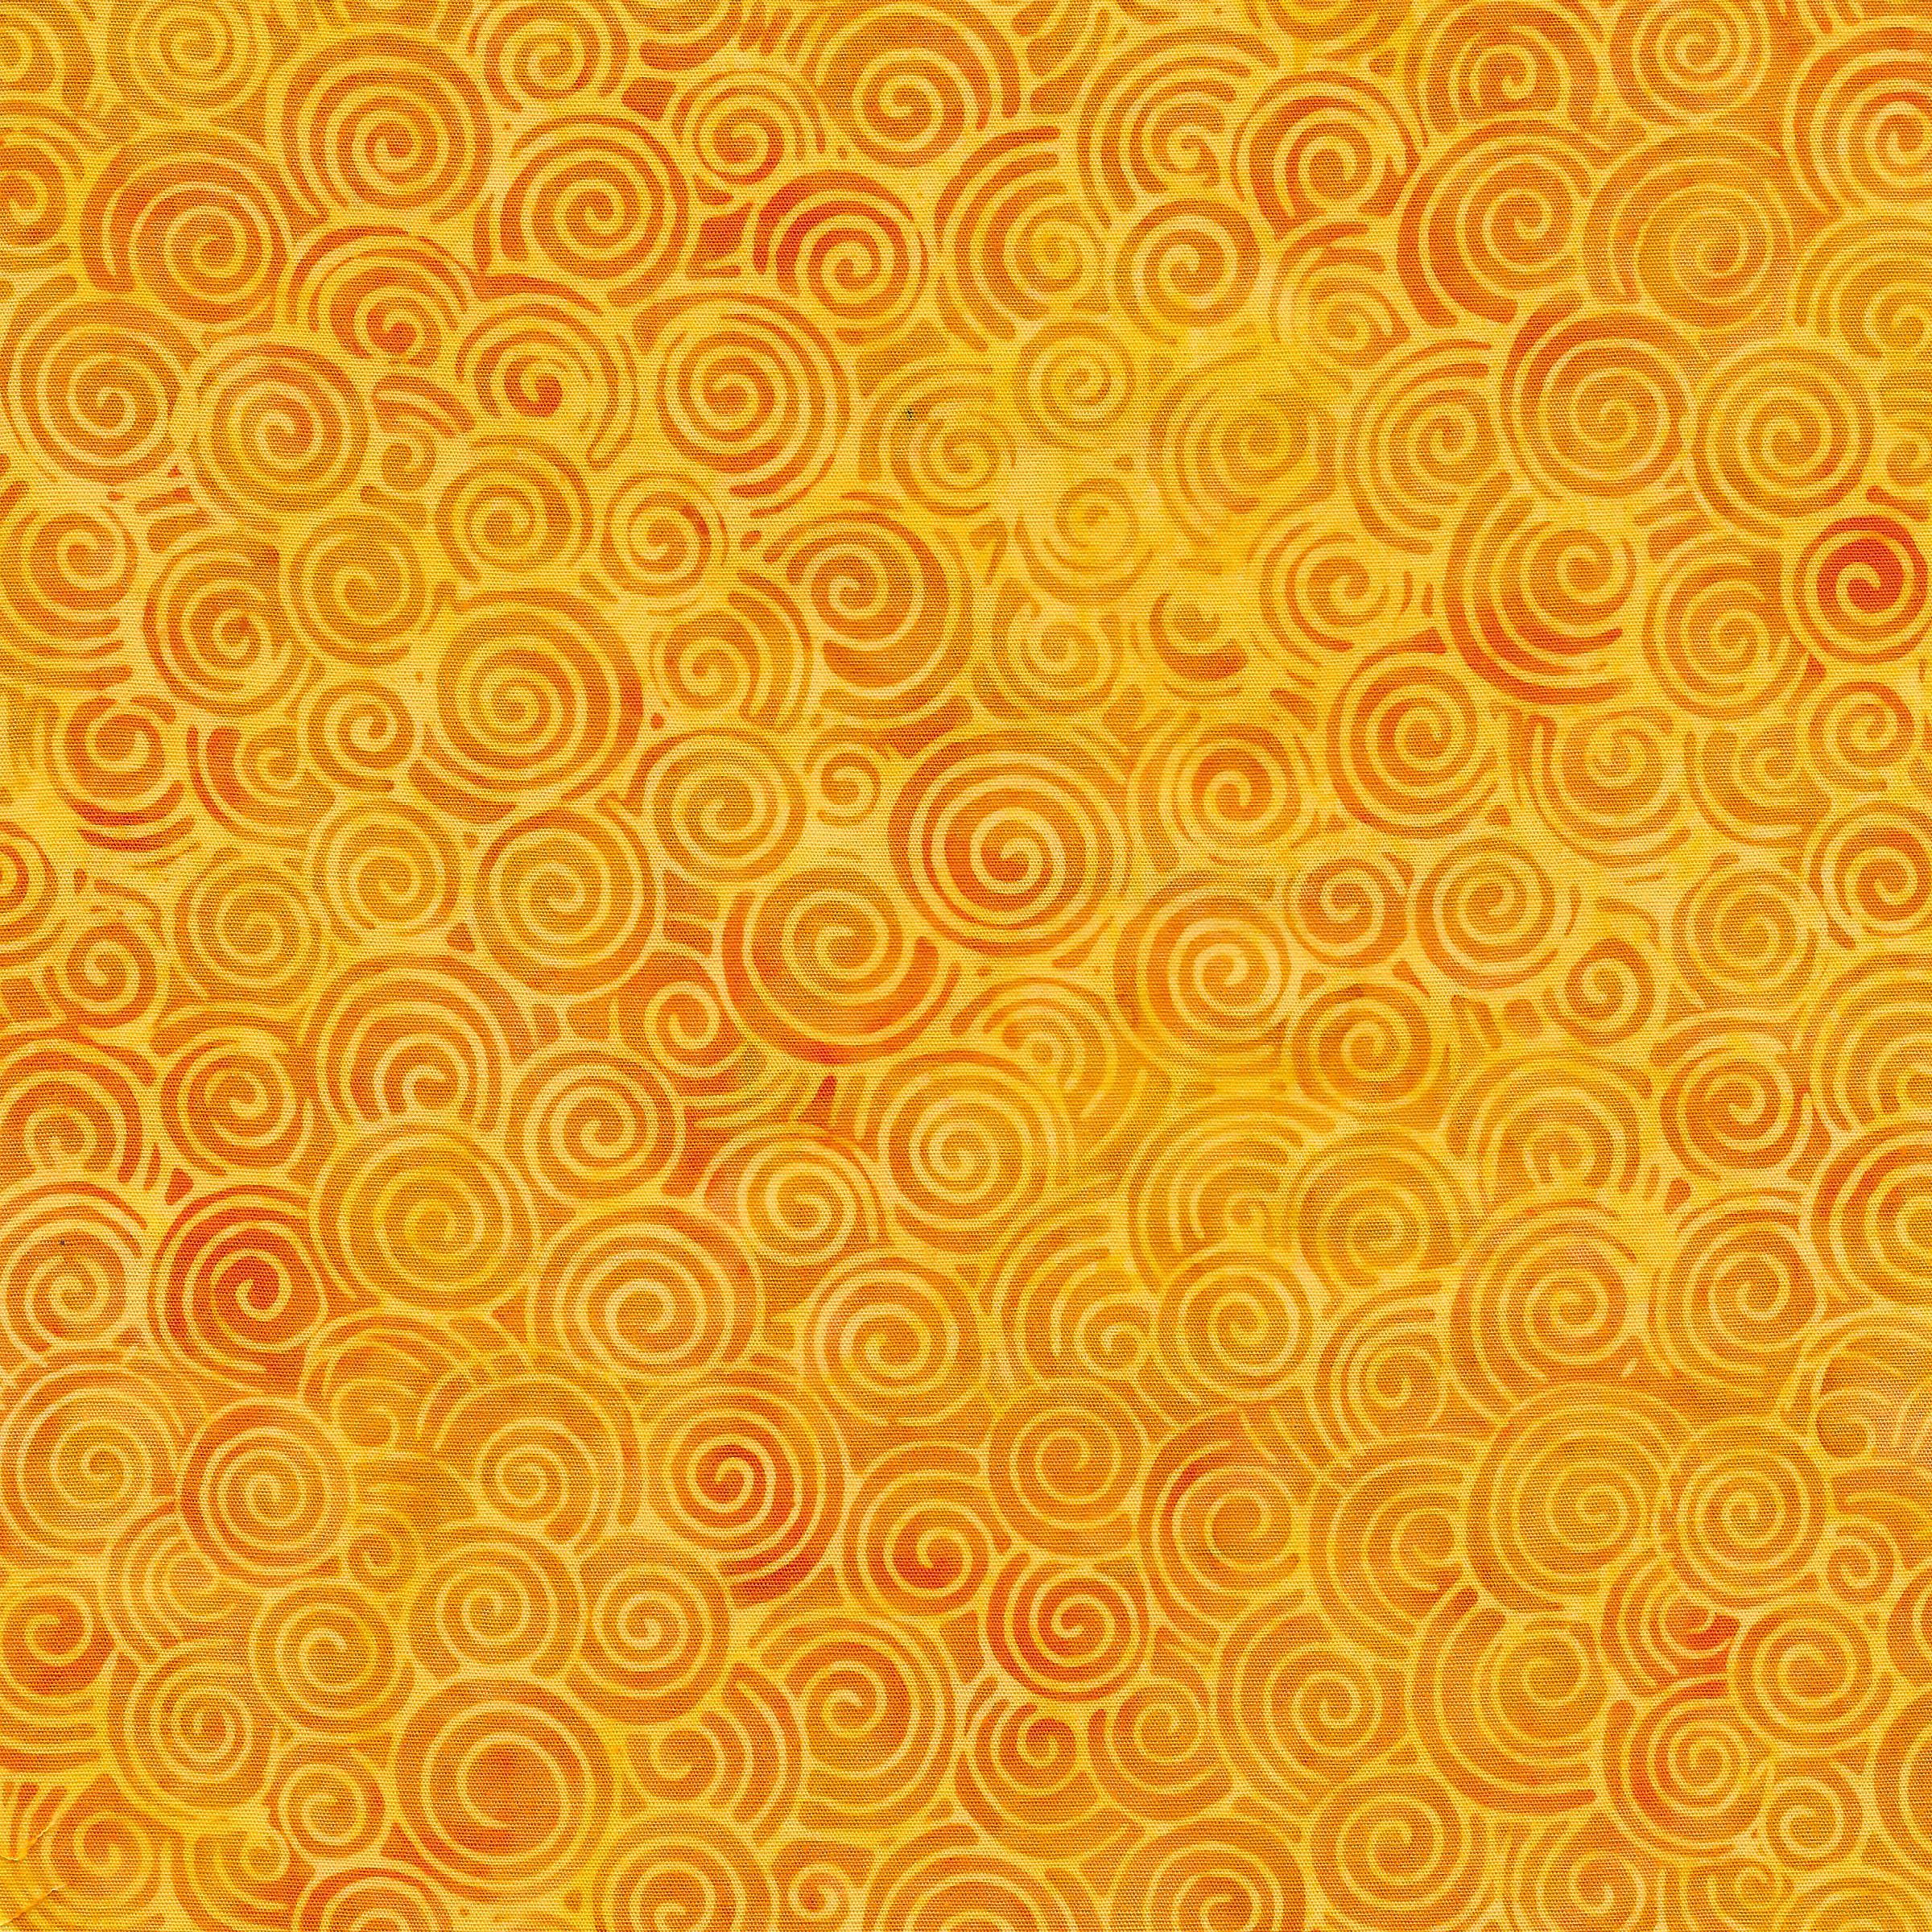 111928140 / Swirl -Daffodil